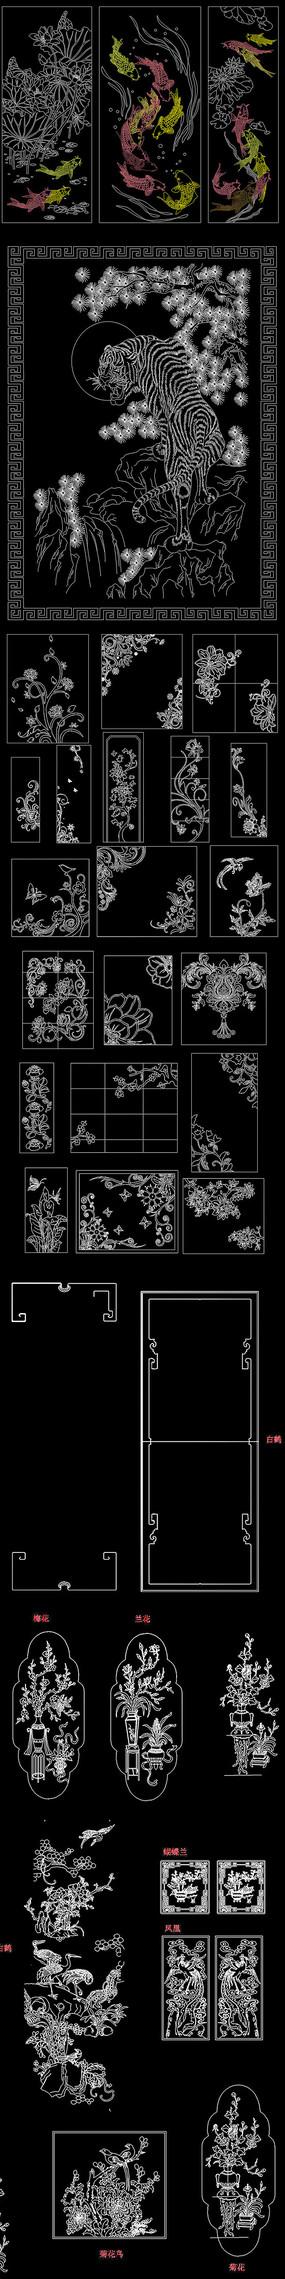 CAD中式花纹图案图纸 dwg